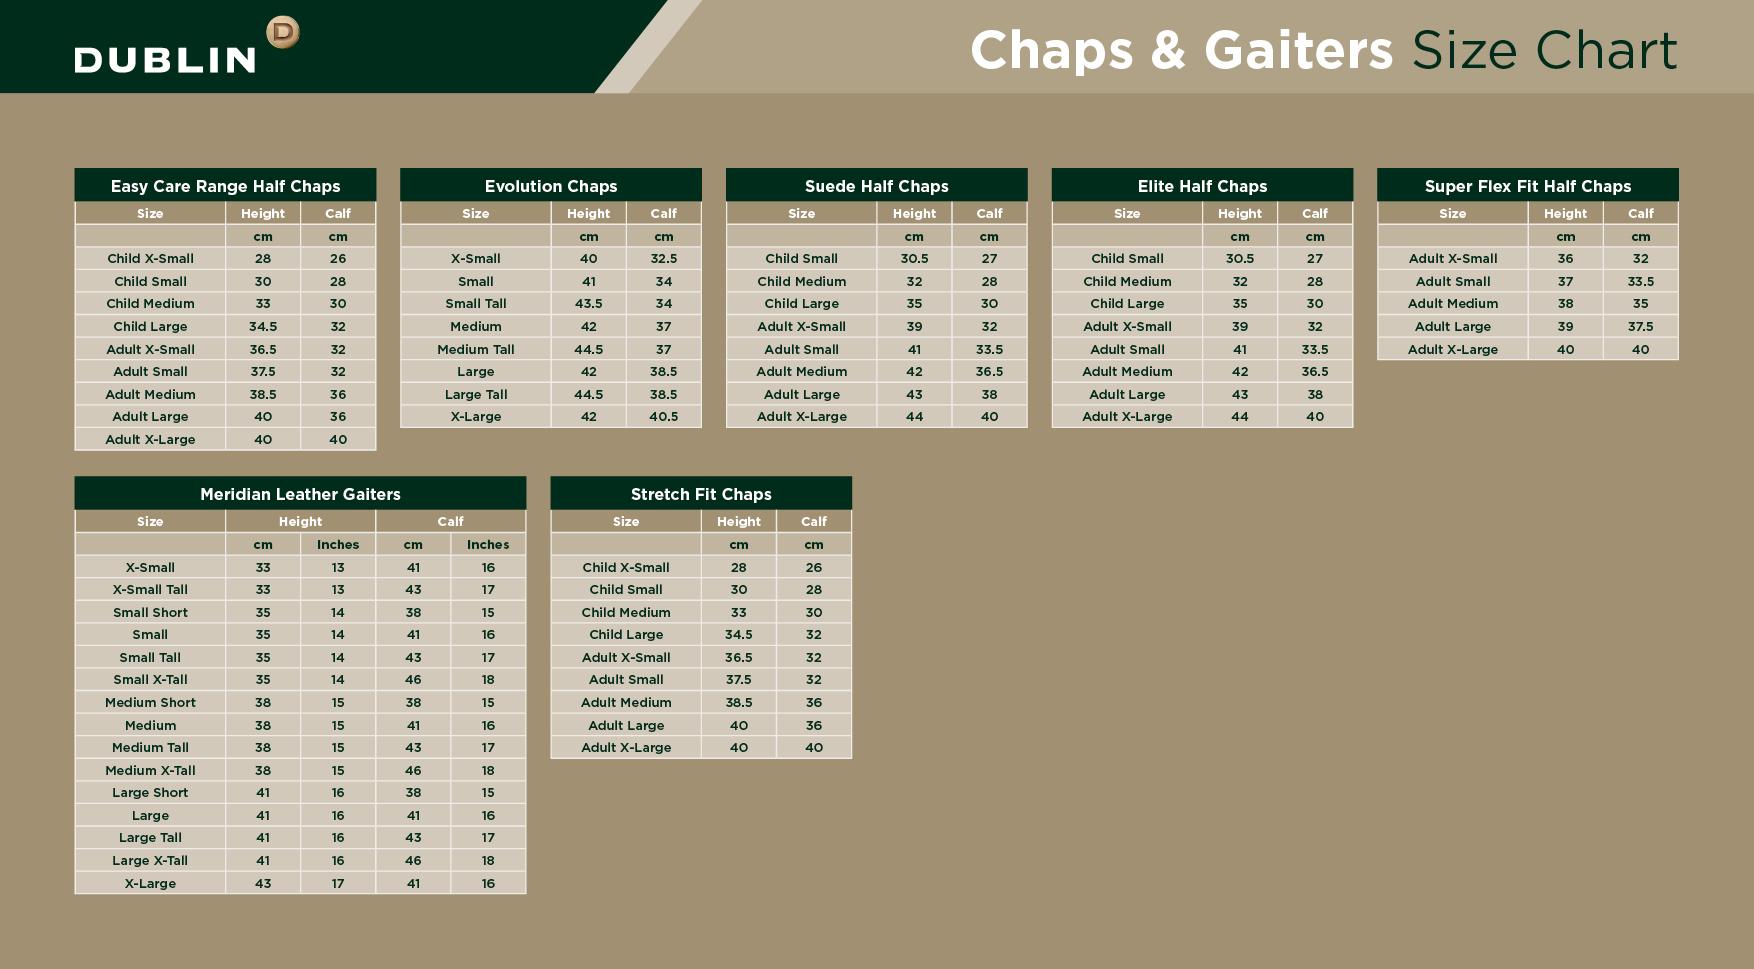 Dublin Chaps & Gaiters Size Chart